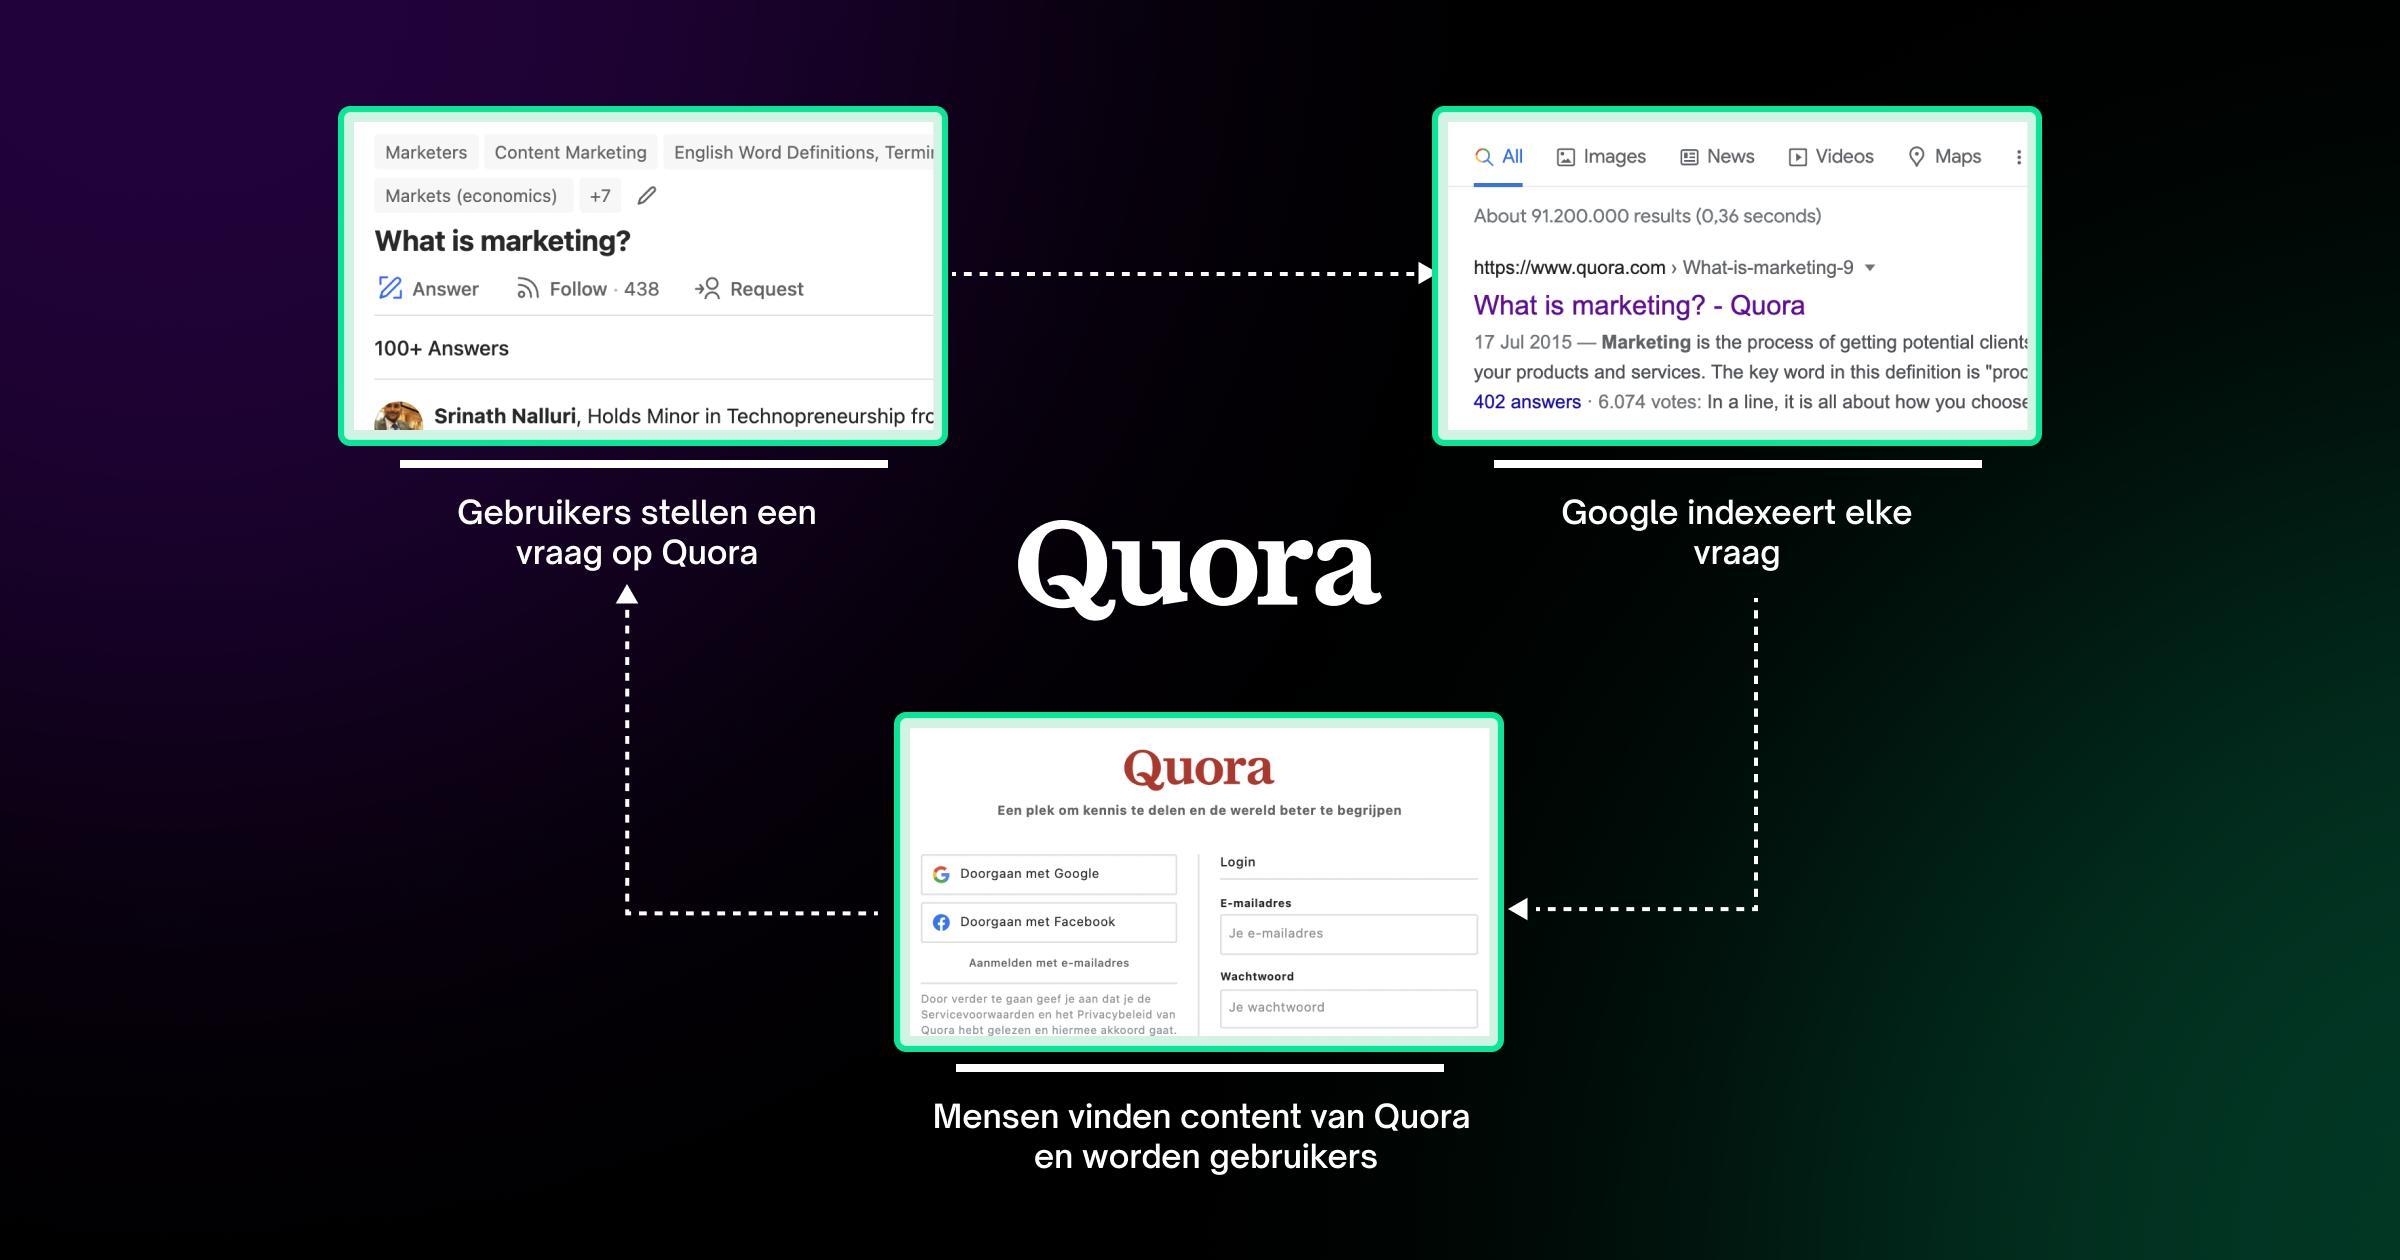 Growth-Marketing-Campagne-Quora-gevisualiseerd